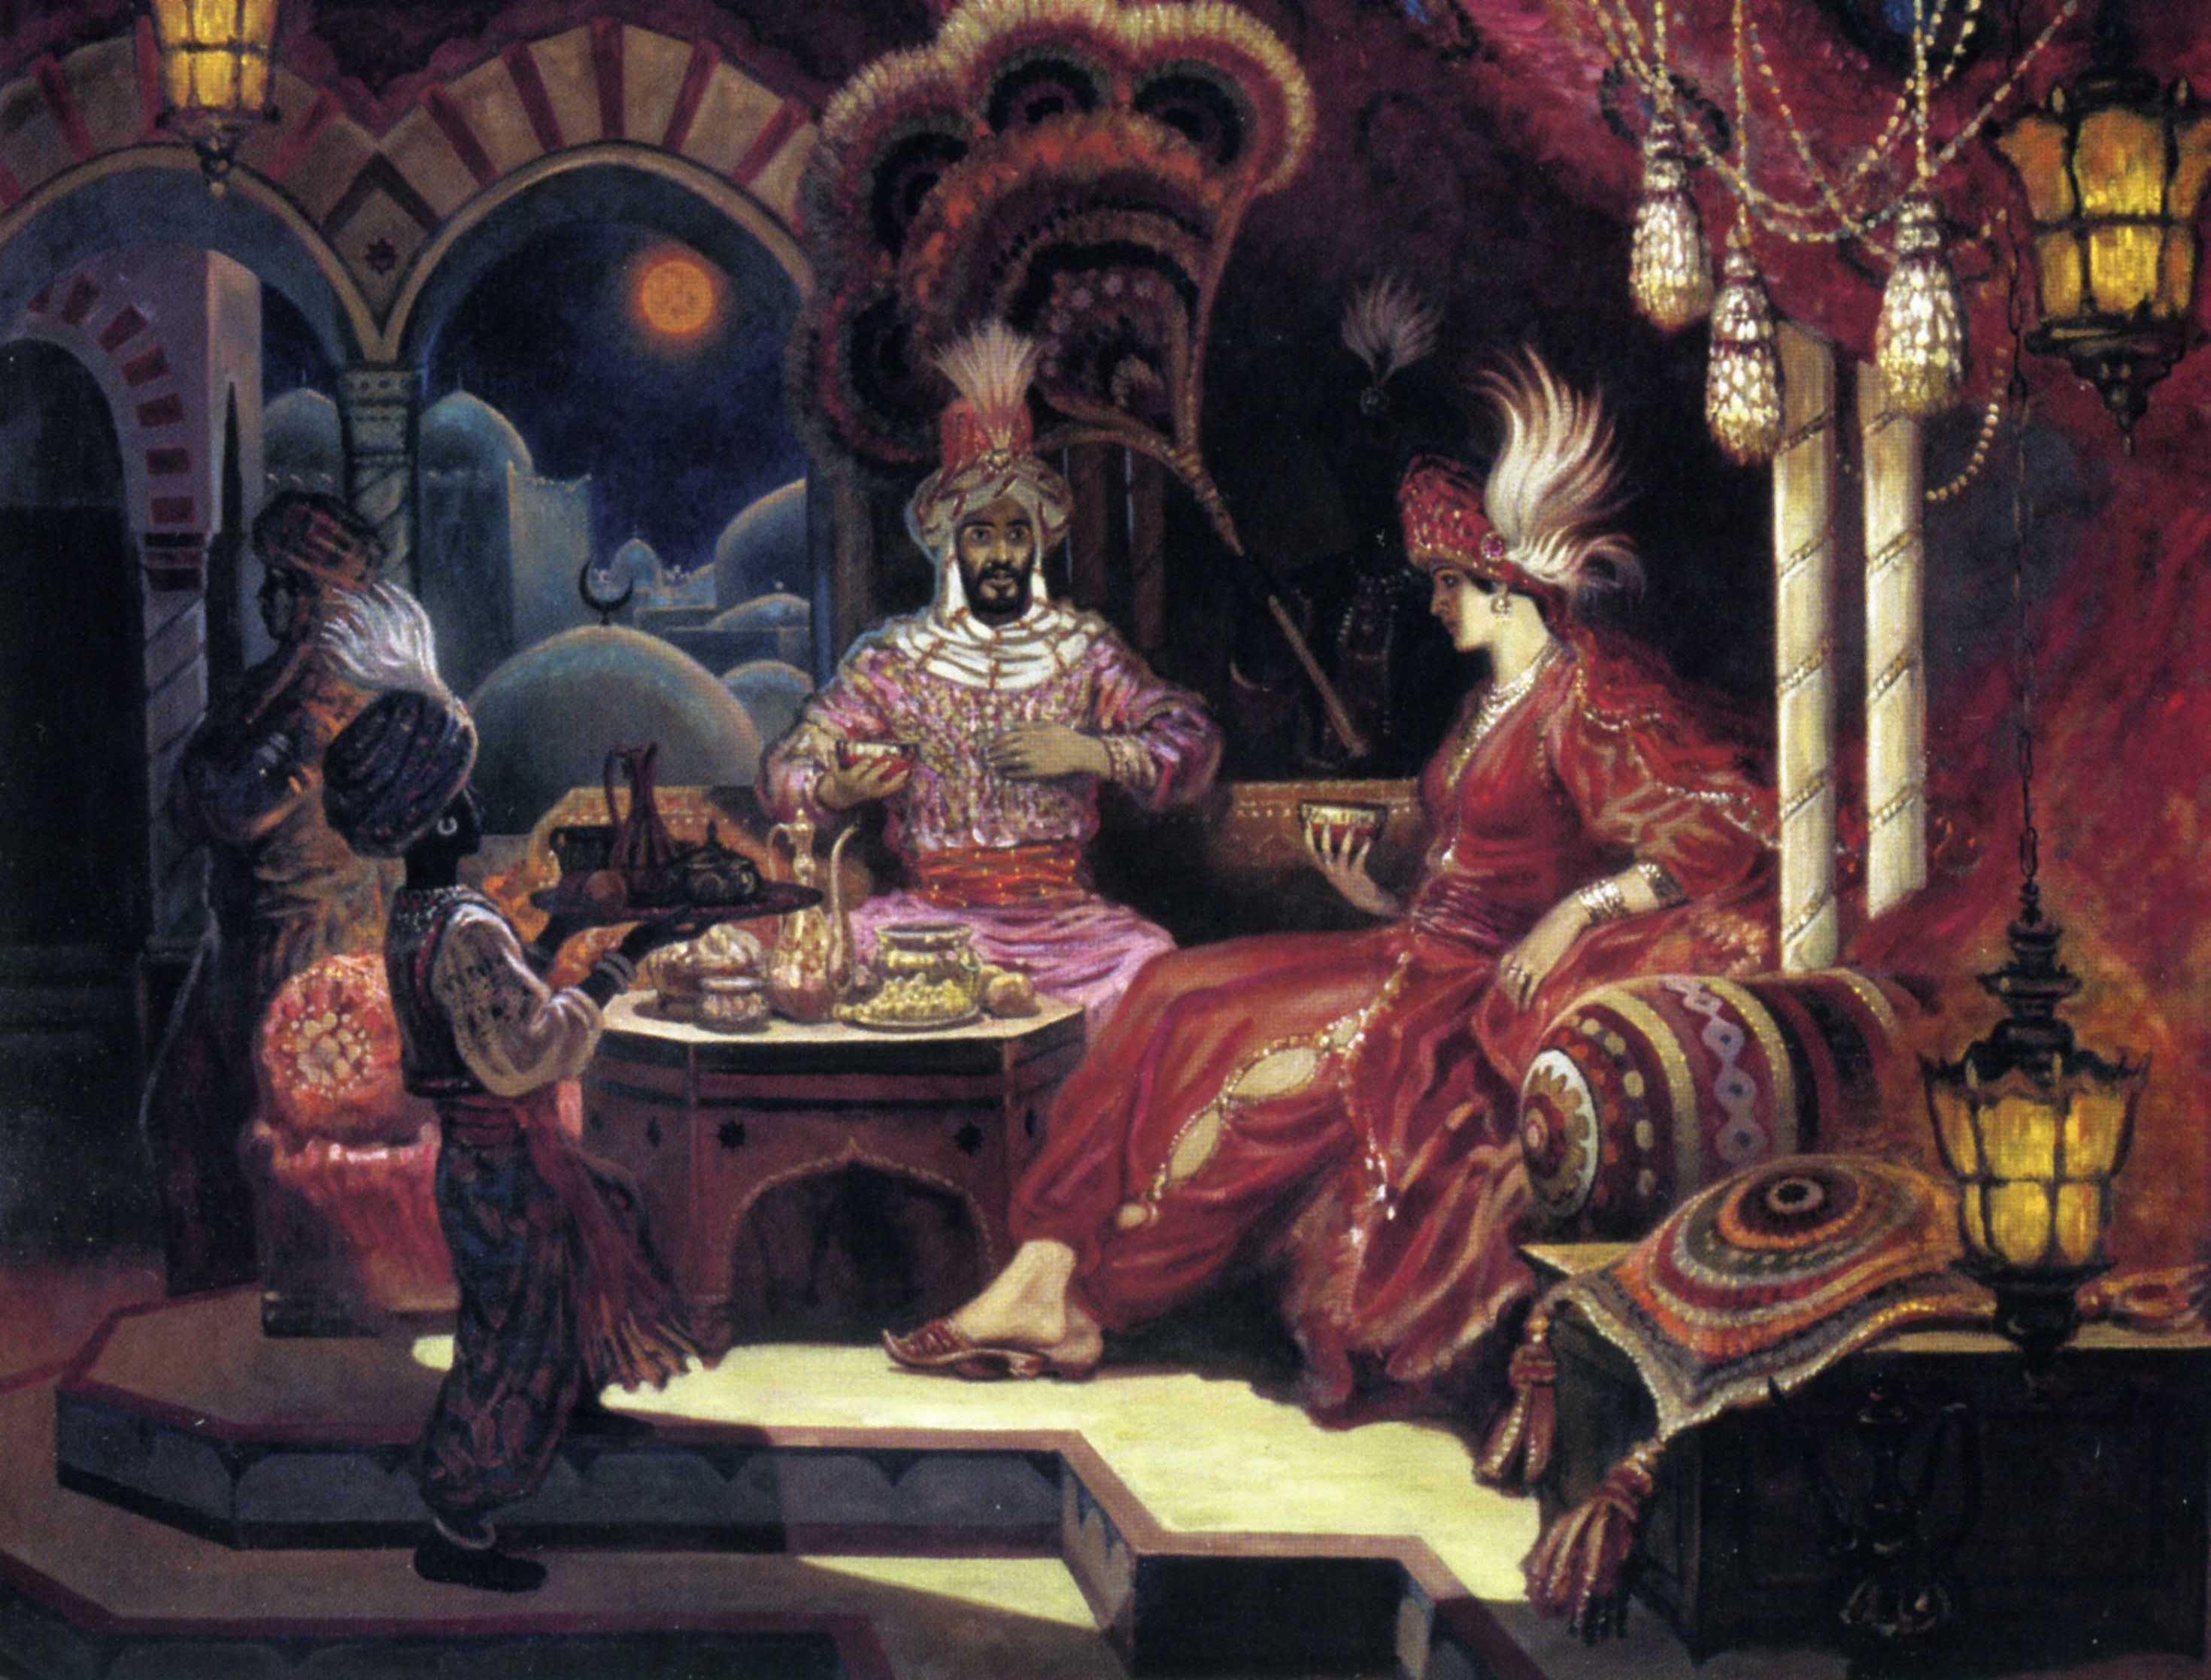 Сказка красного дворца